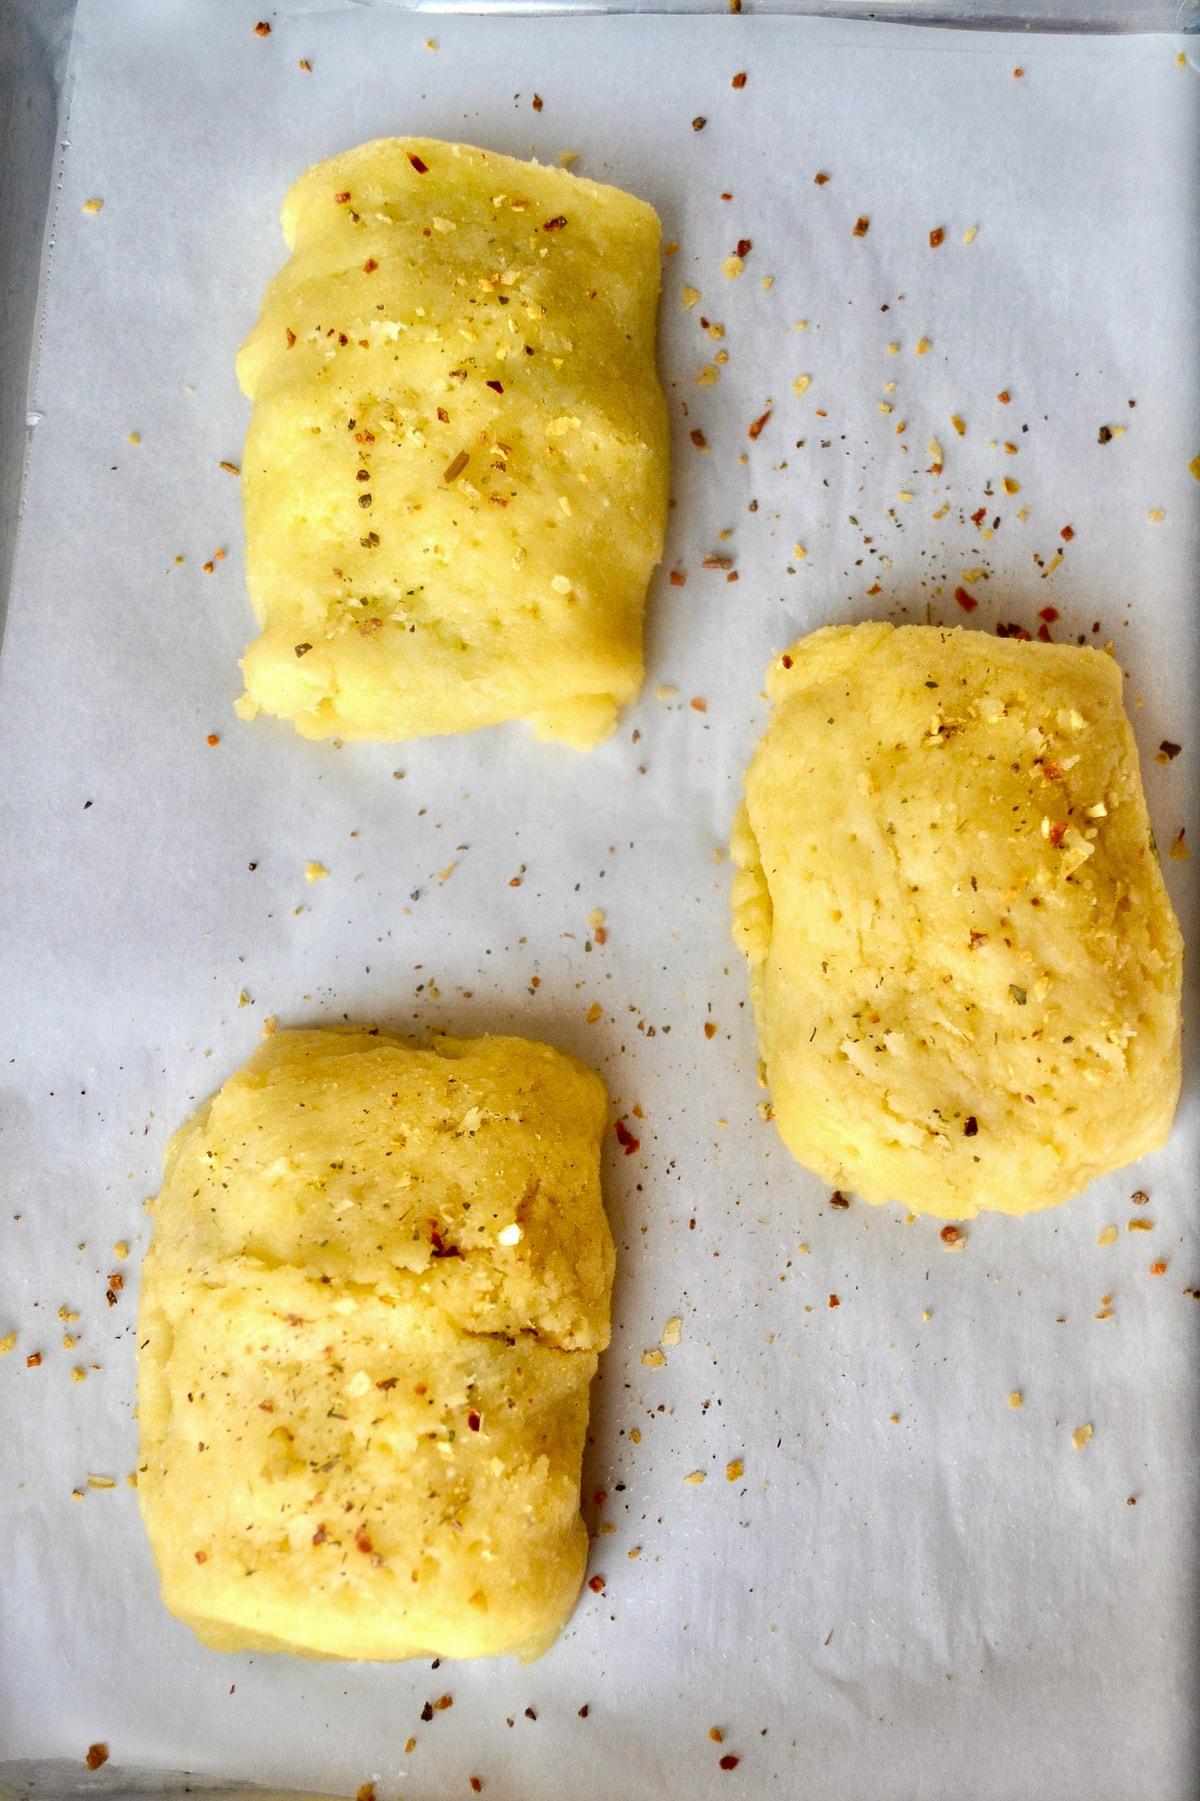 Keto breakfast hot pockets before baking